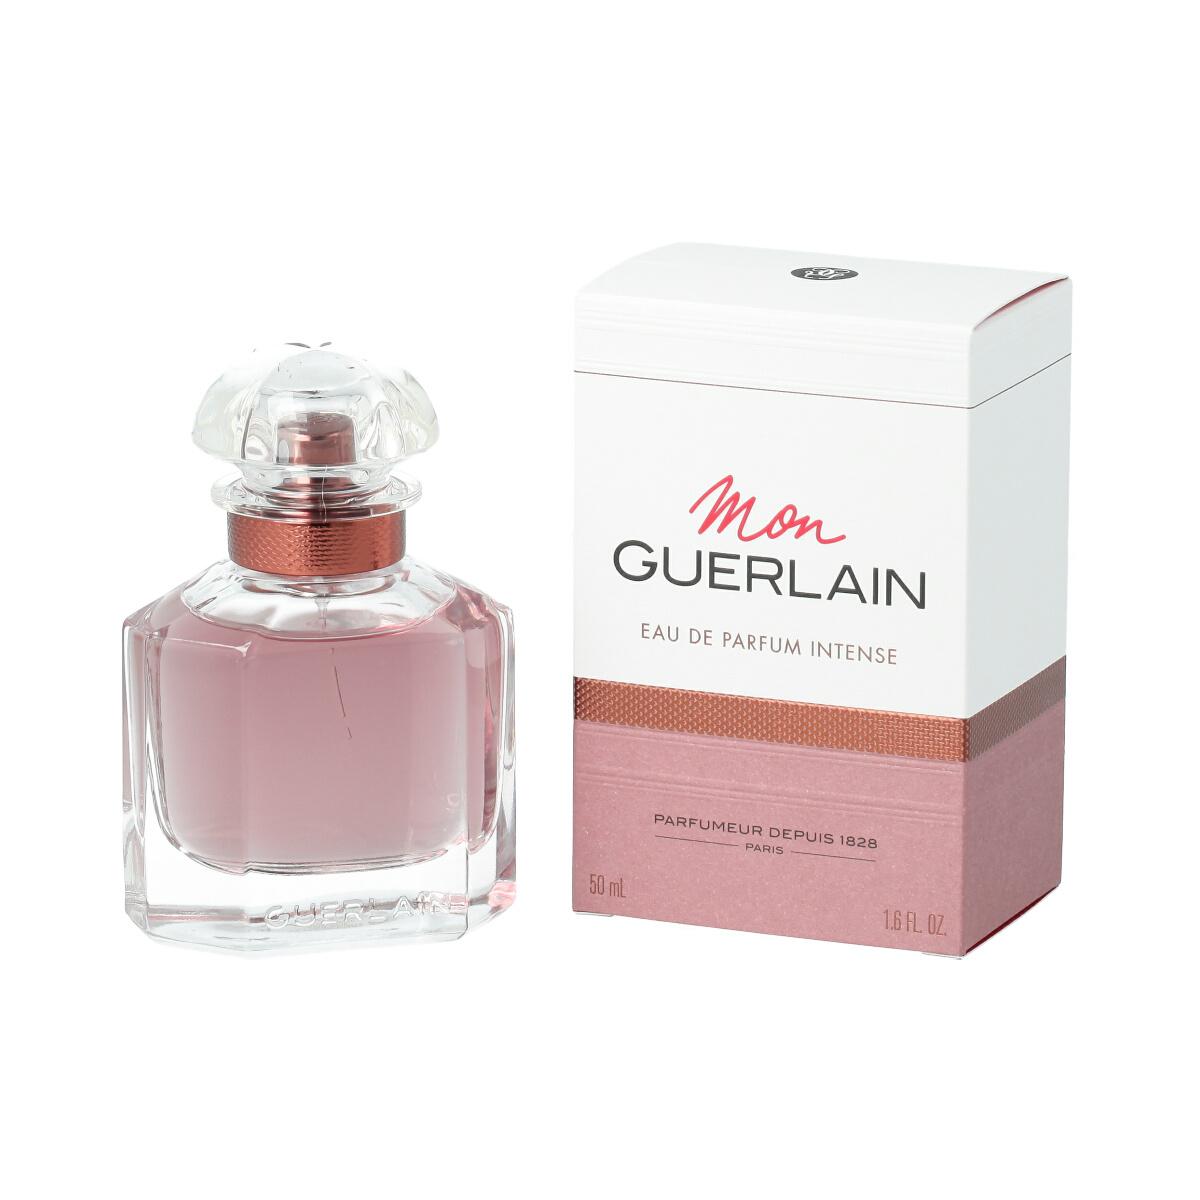 Guerlain Mon Guerlain Eau De Parfum Intense EDP 50 ml (woman) 19184